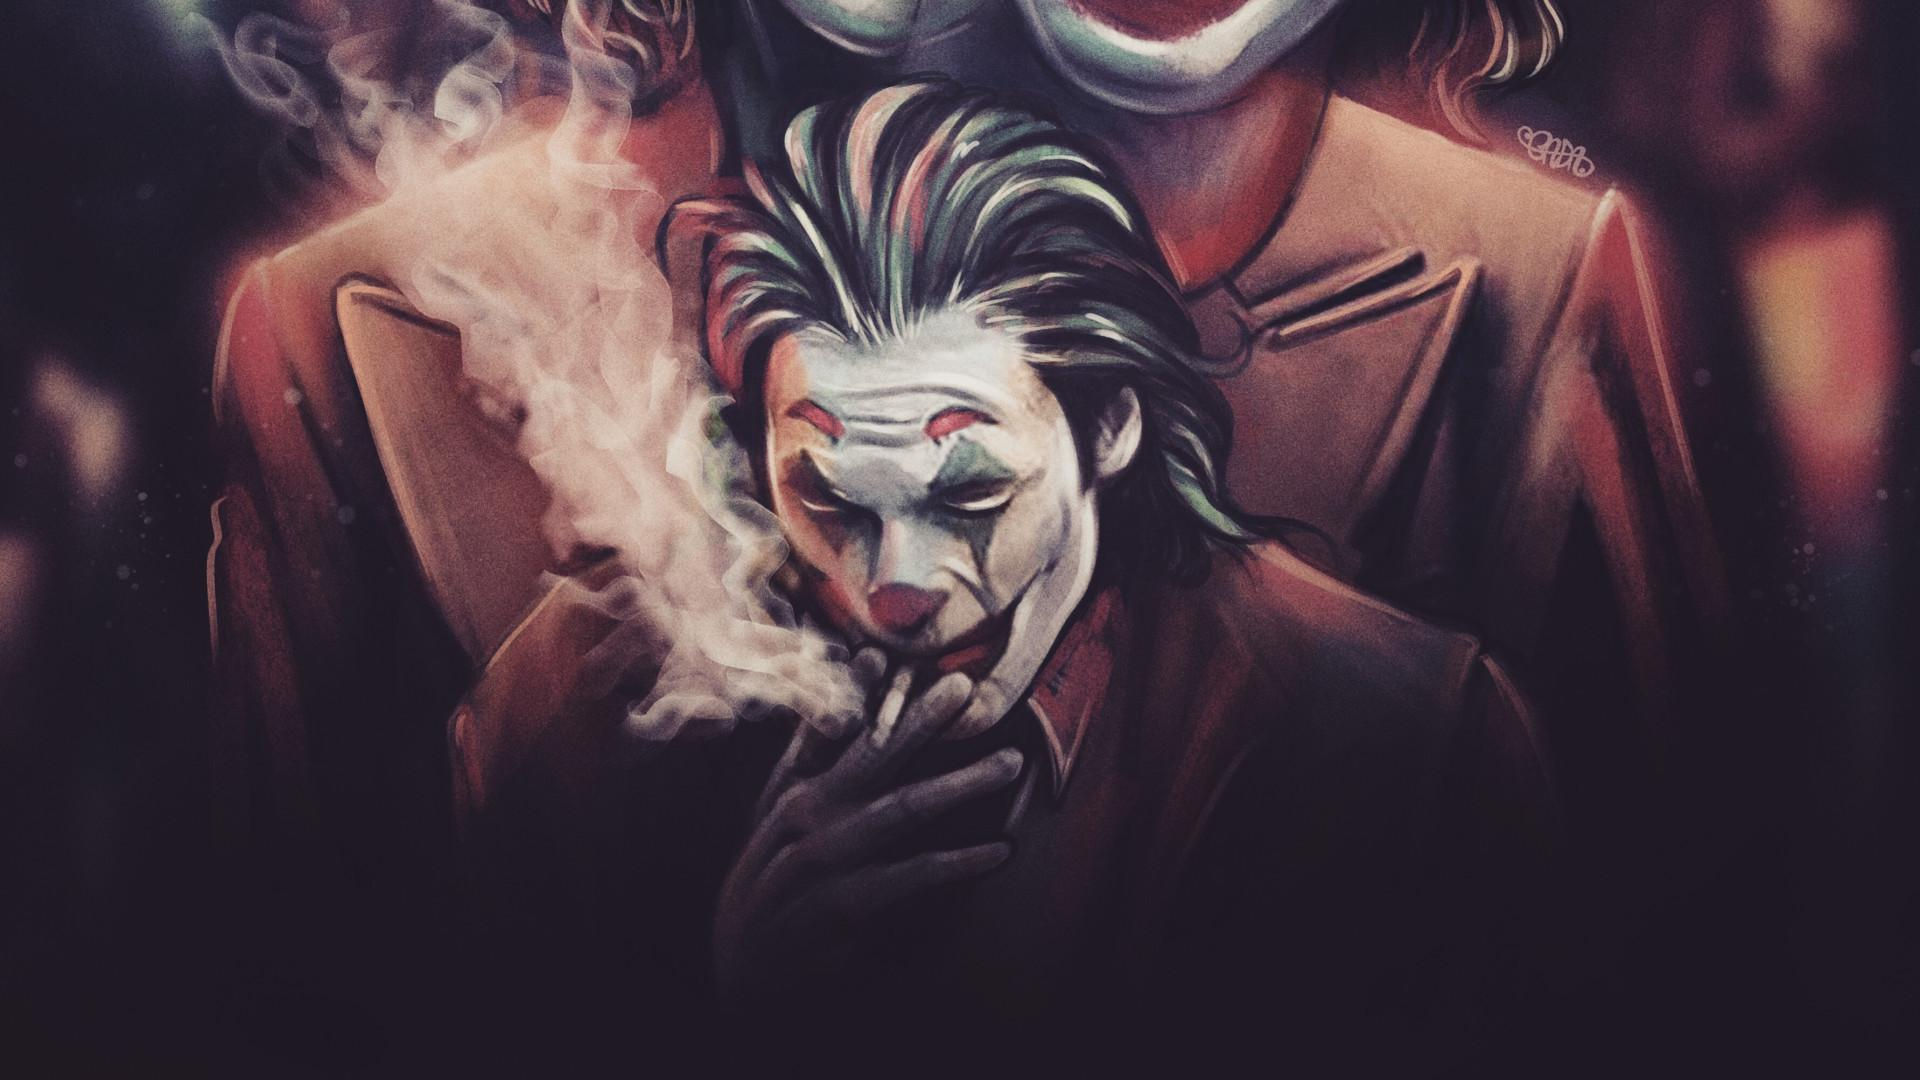 Joker Smoke Wallpapers - Wallpaper Cave